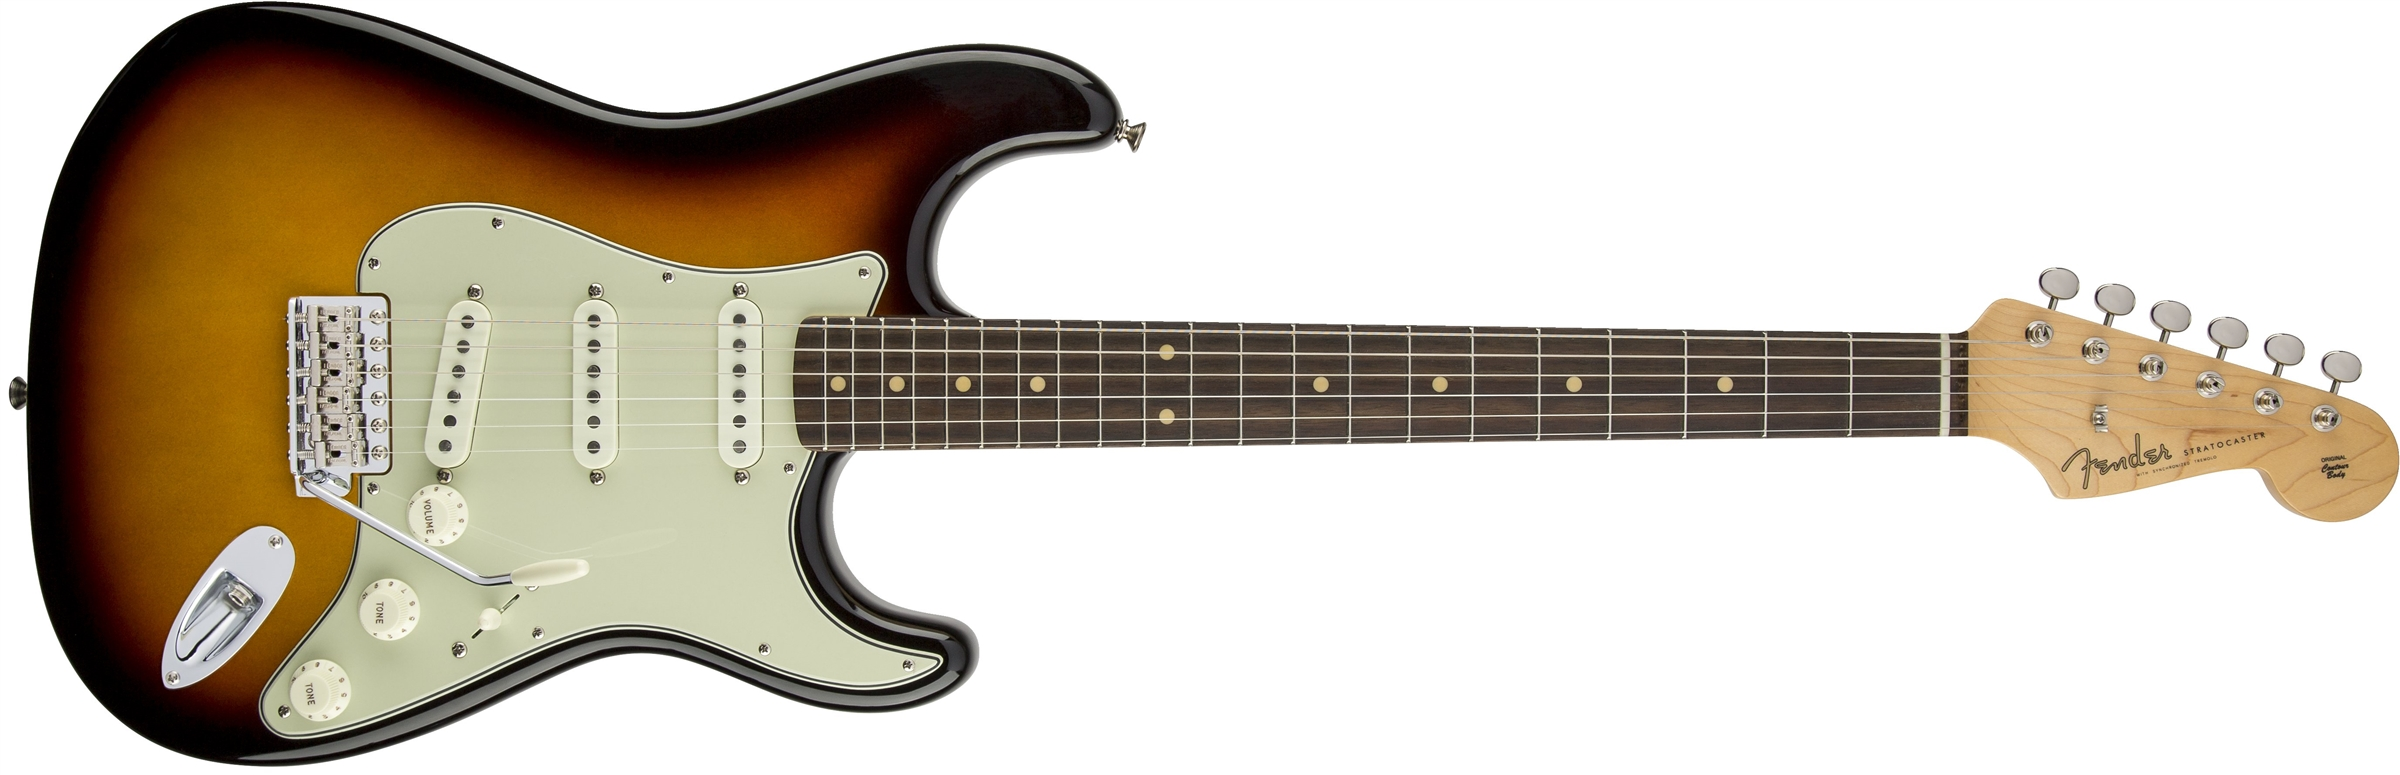 american vintage 59 stratocaster® fender electric guitars american vintage 59 stratocaster® 3 color sunburst